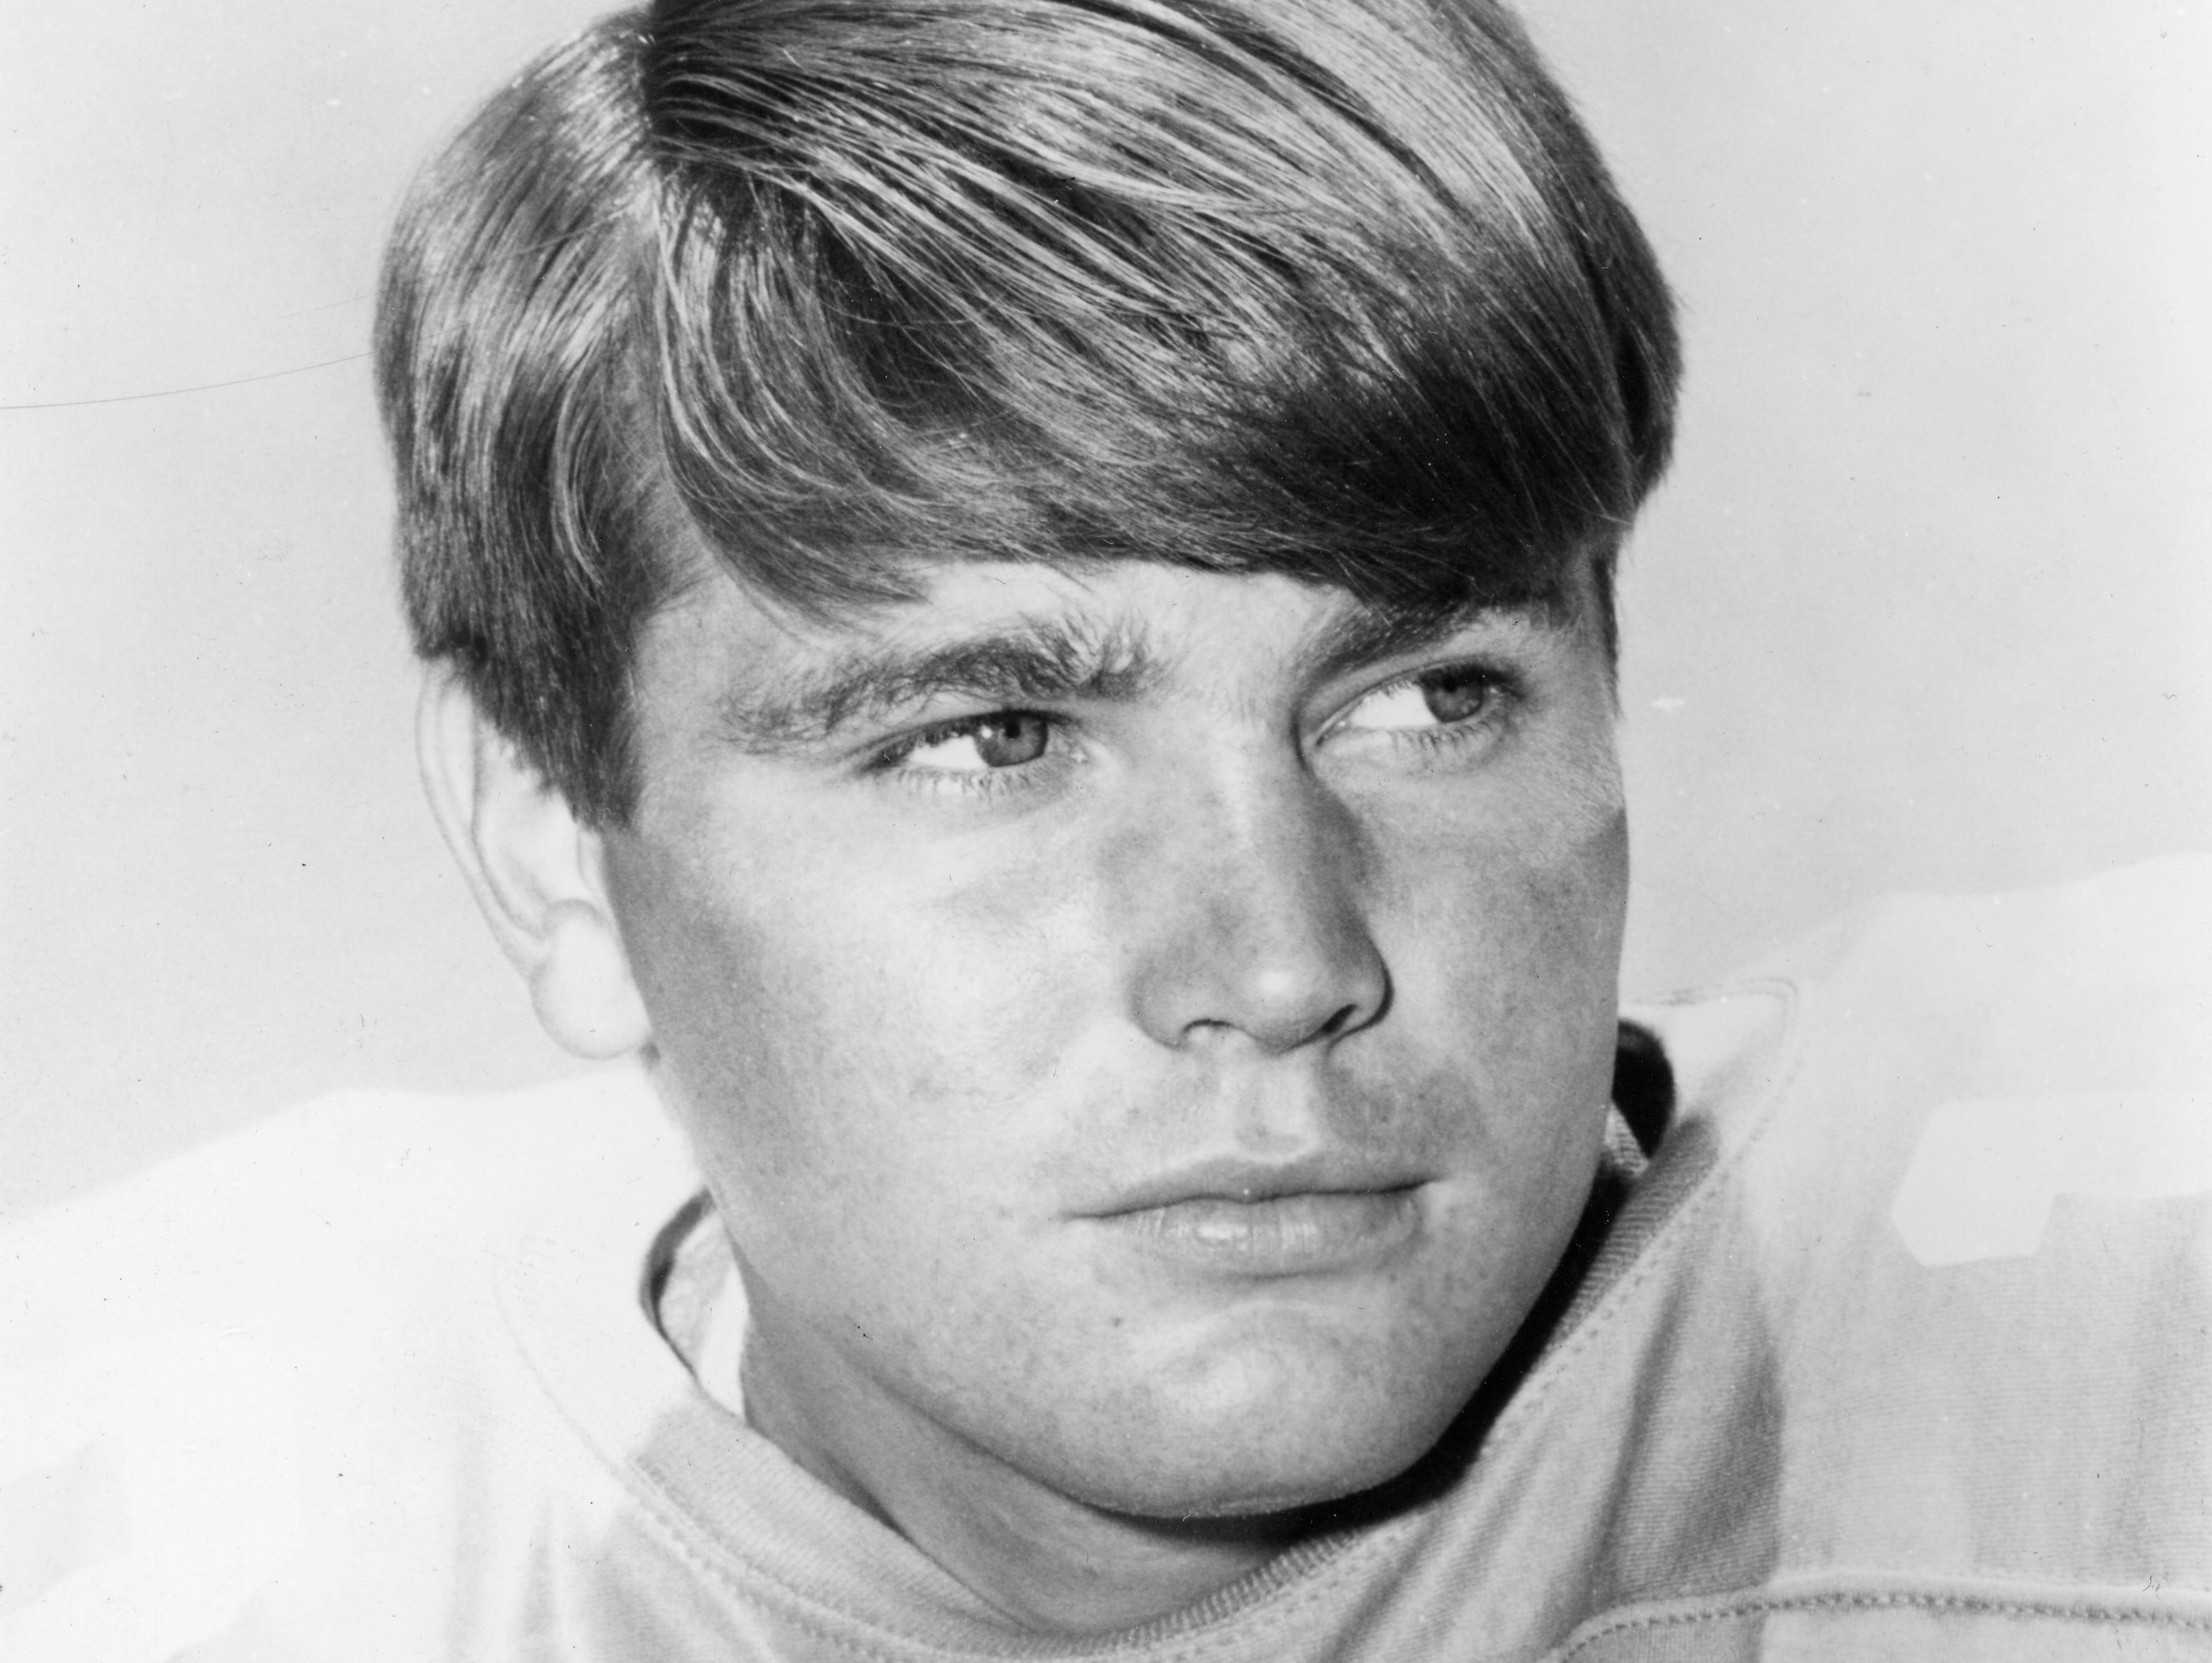 Tennessee Vols quarterback Bobby Scott on August 27, 1969.